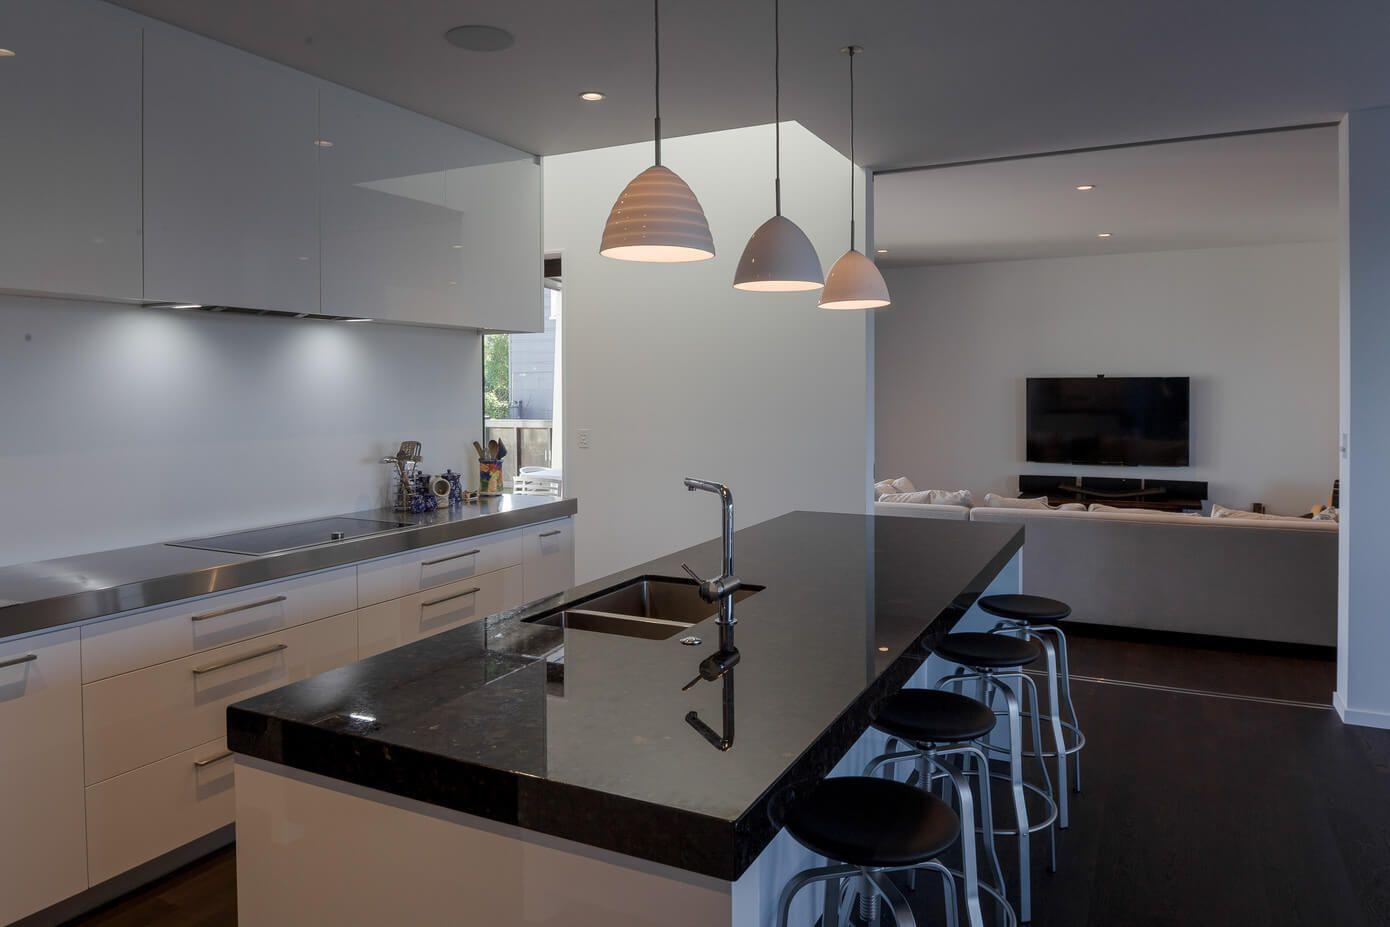 mclaren-house-archaus-architects-04